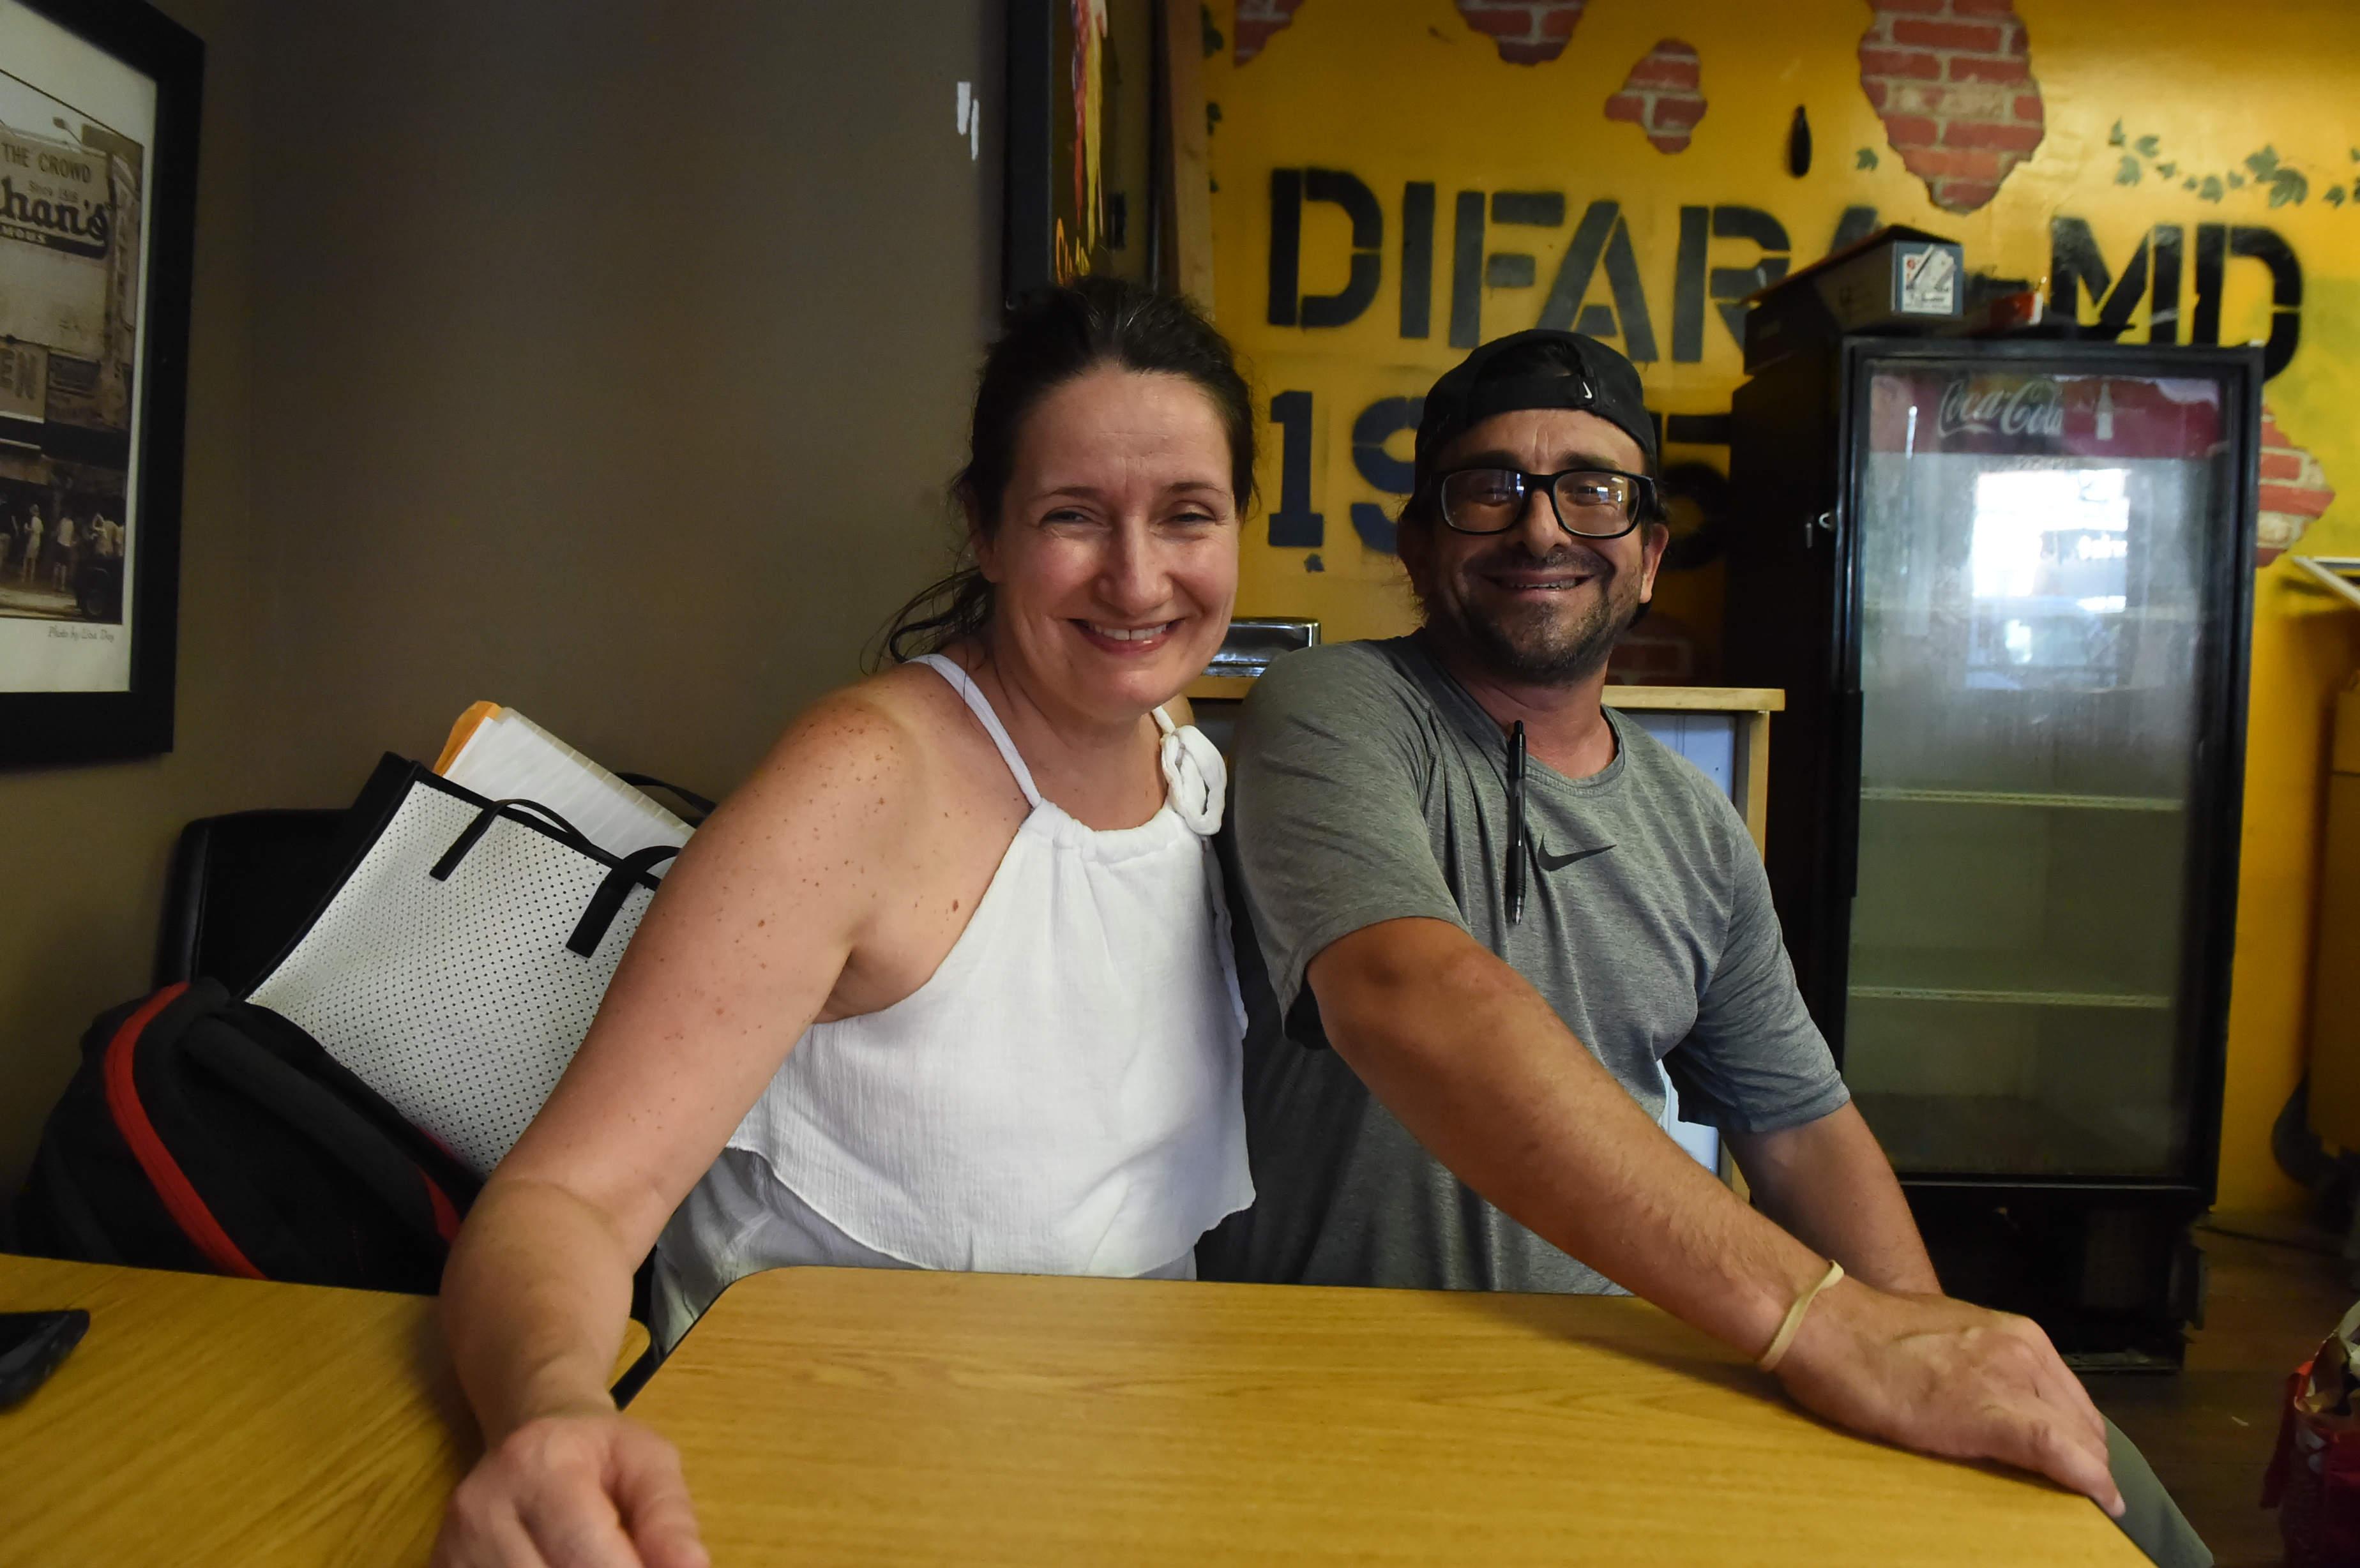 Di Fara Pizzeria in Midwood Wows To Re-Open